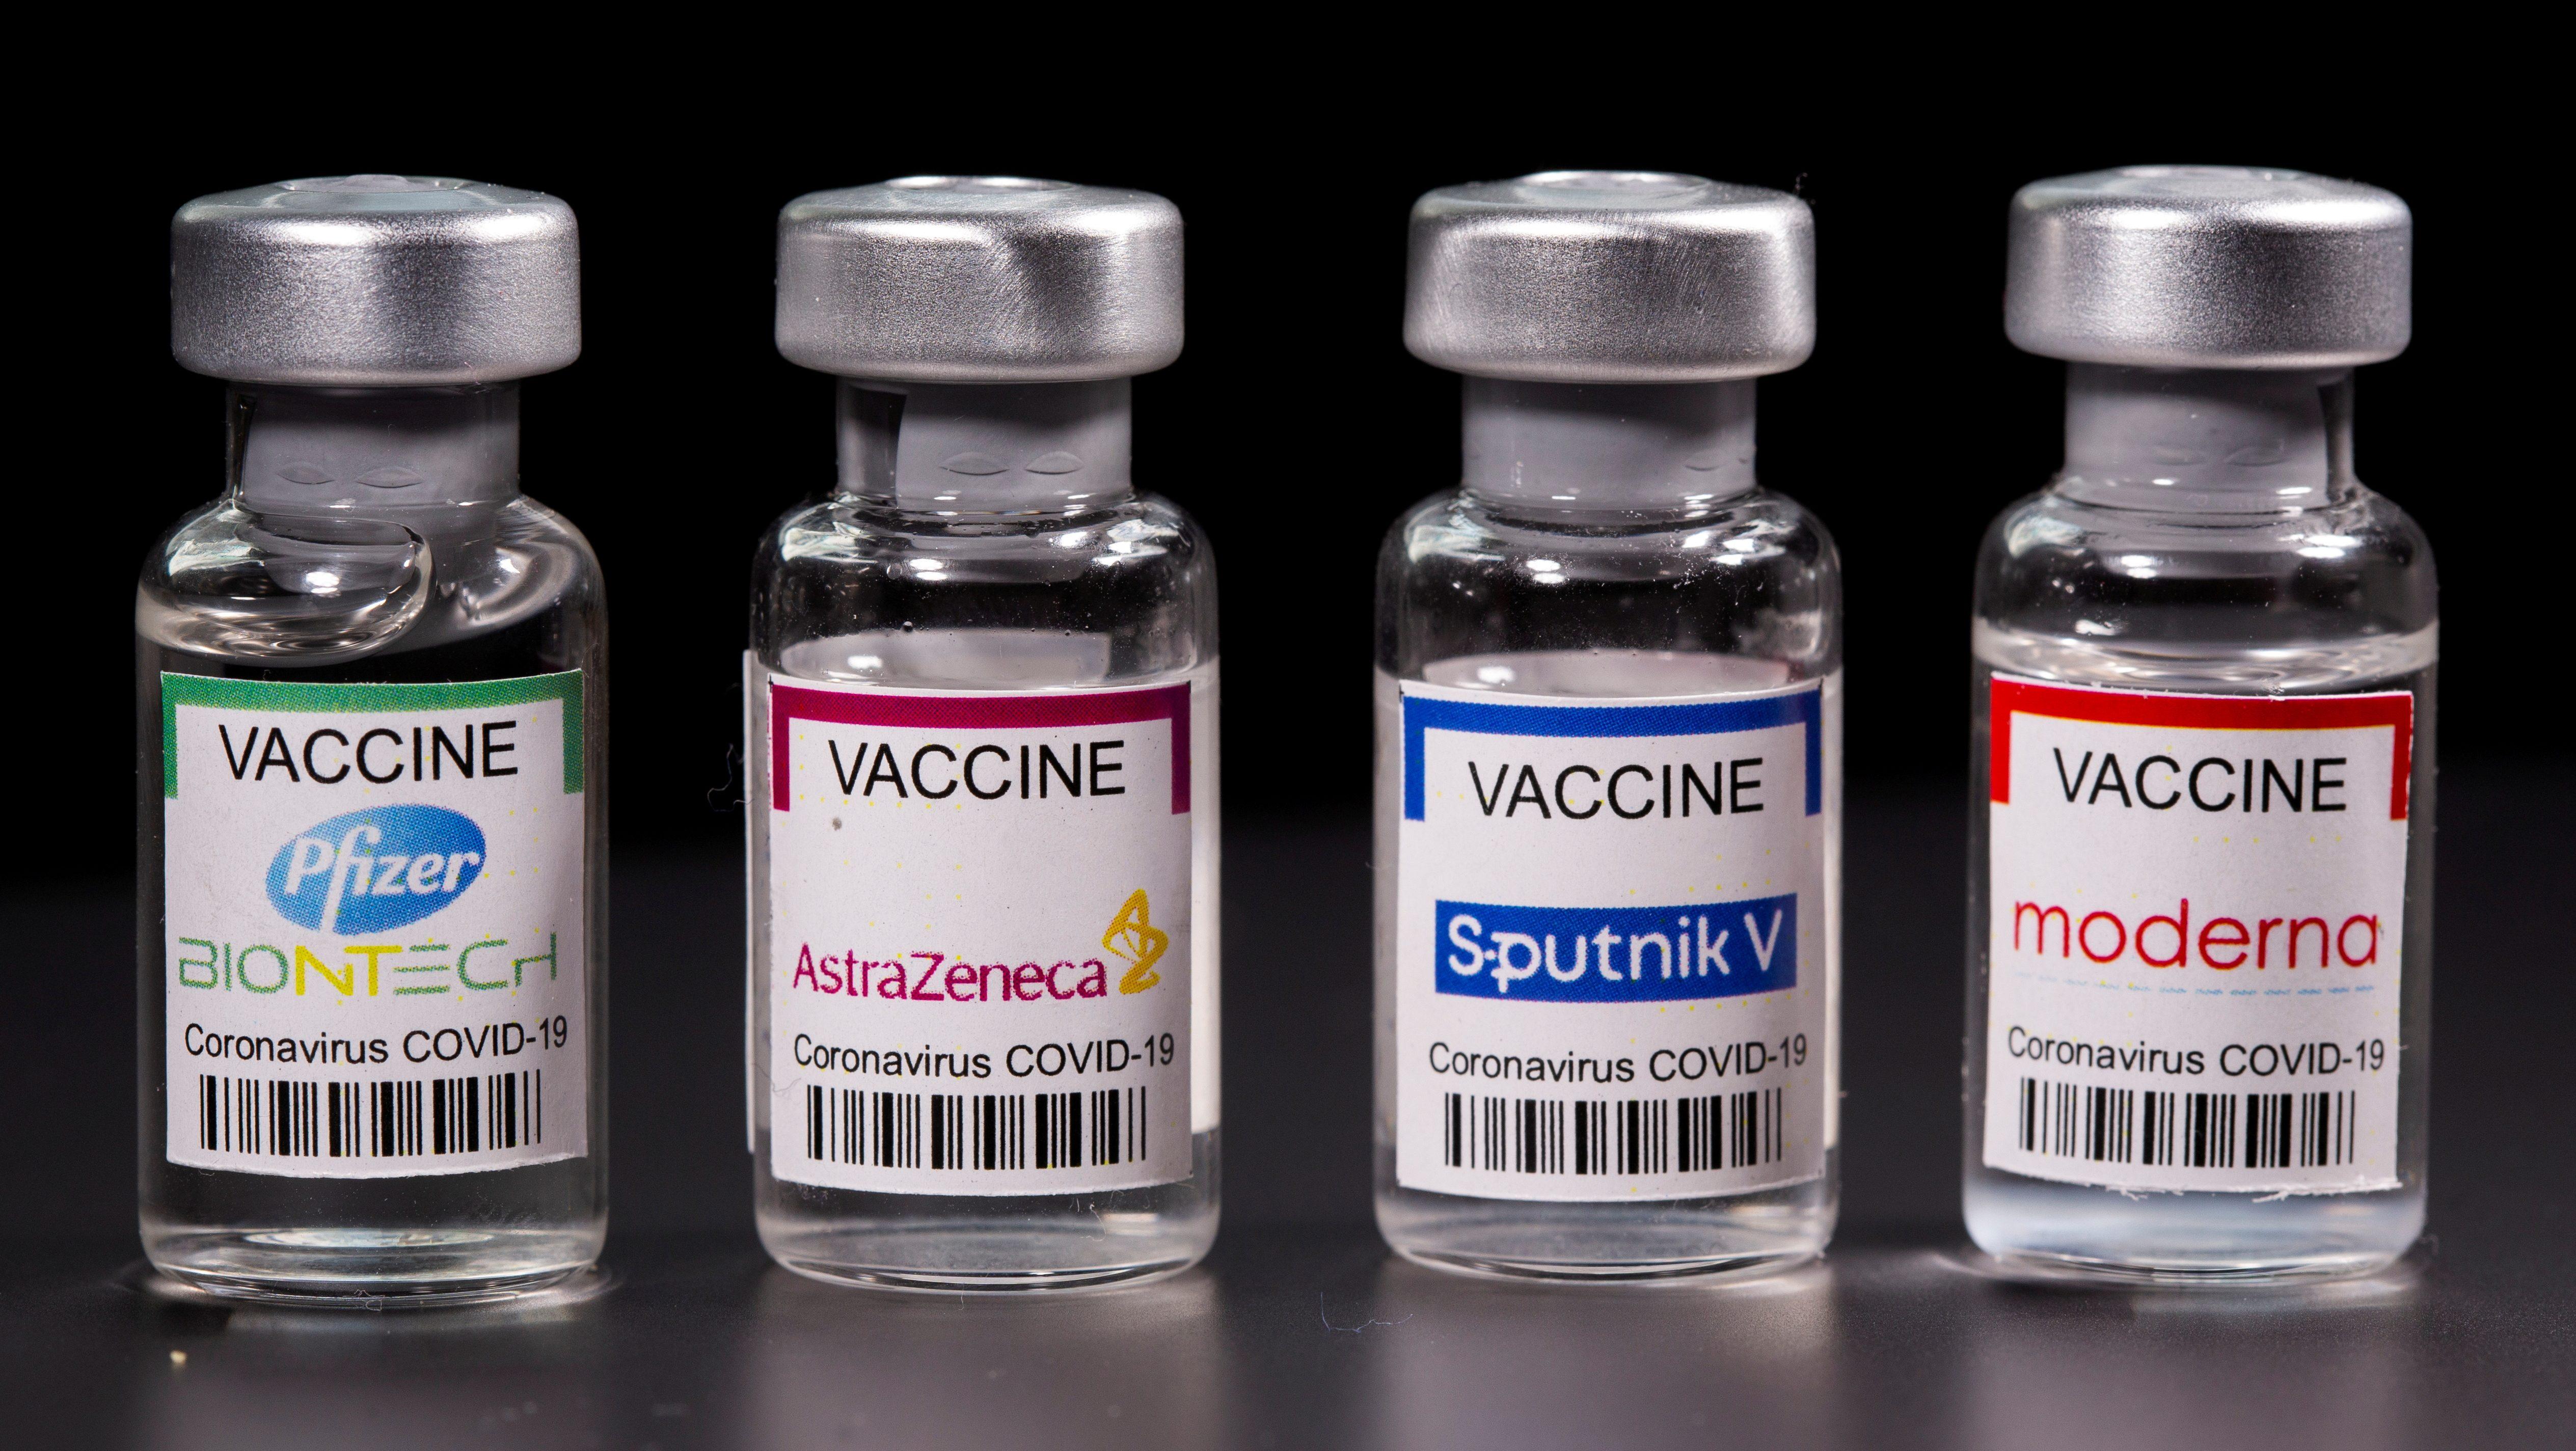 Vials of Pfizer, Moderna, AstraZeneka, SputnikCovid-19 vaccine displayed side by side.